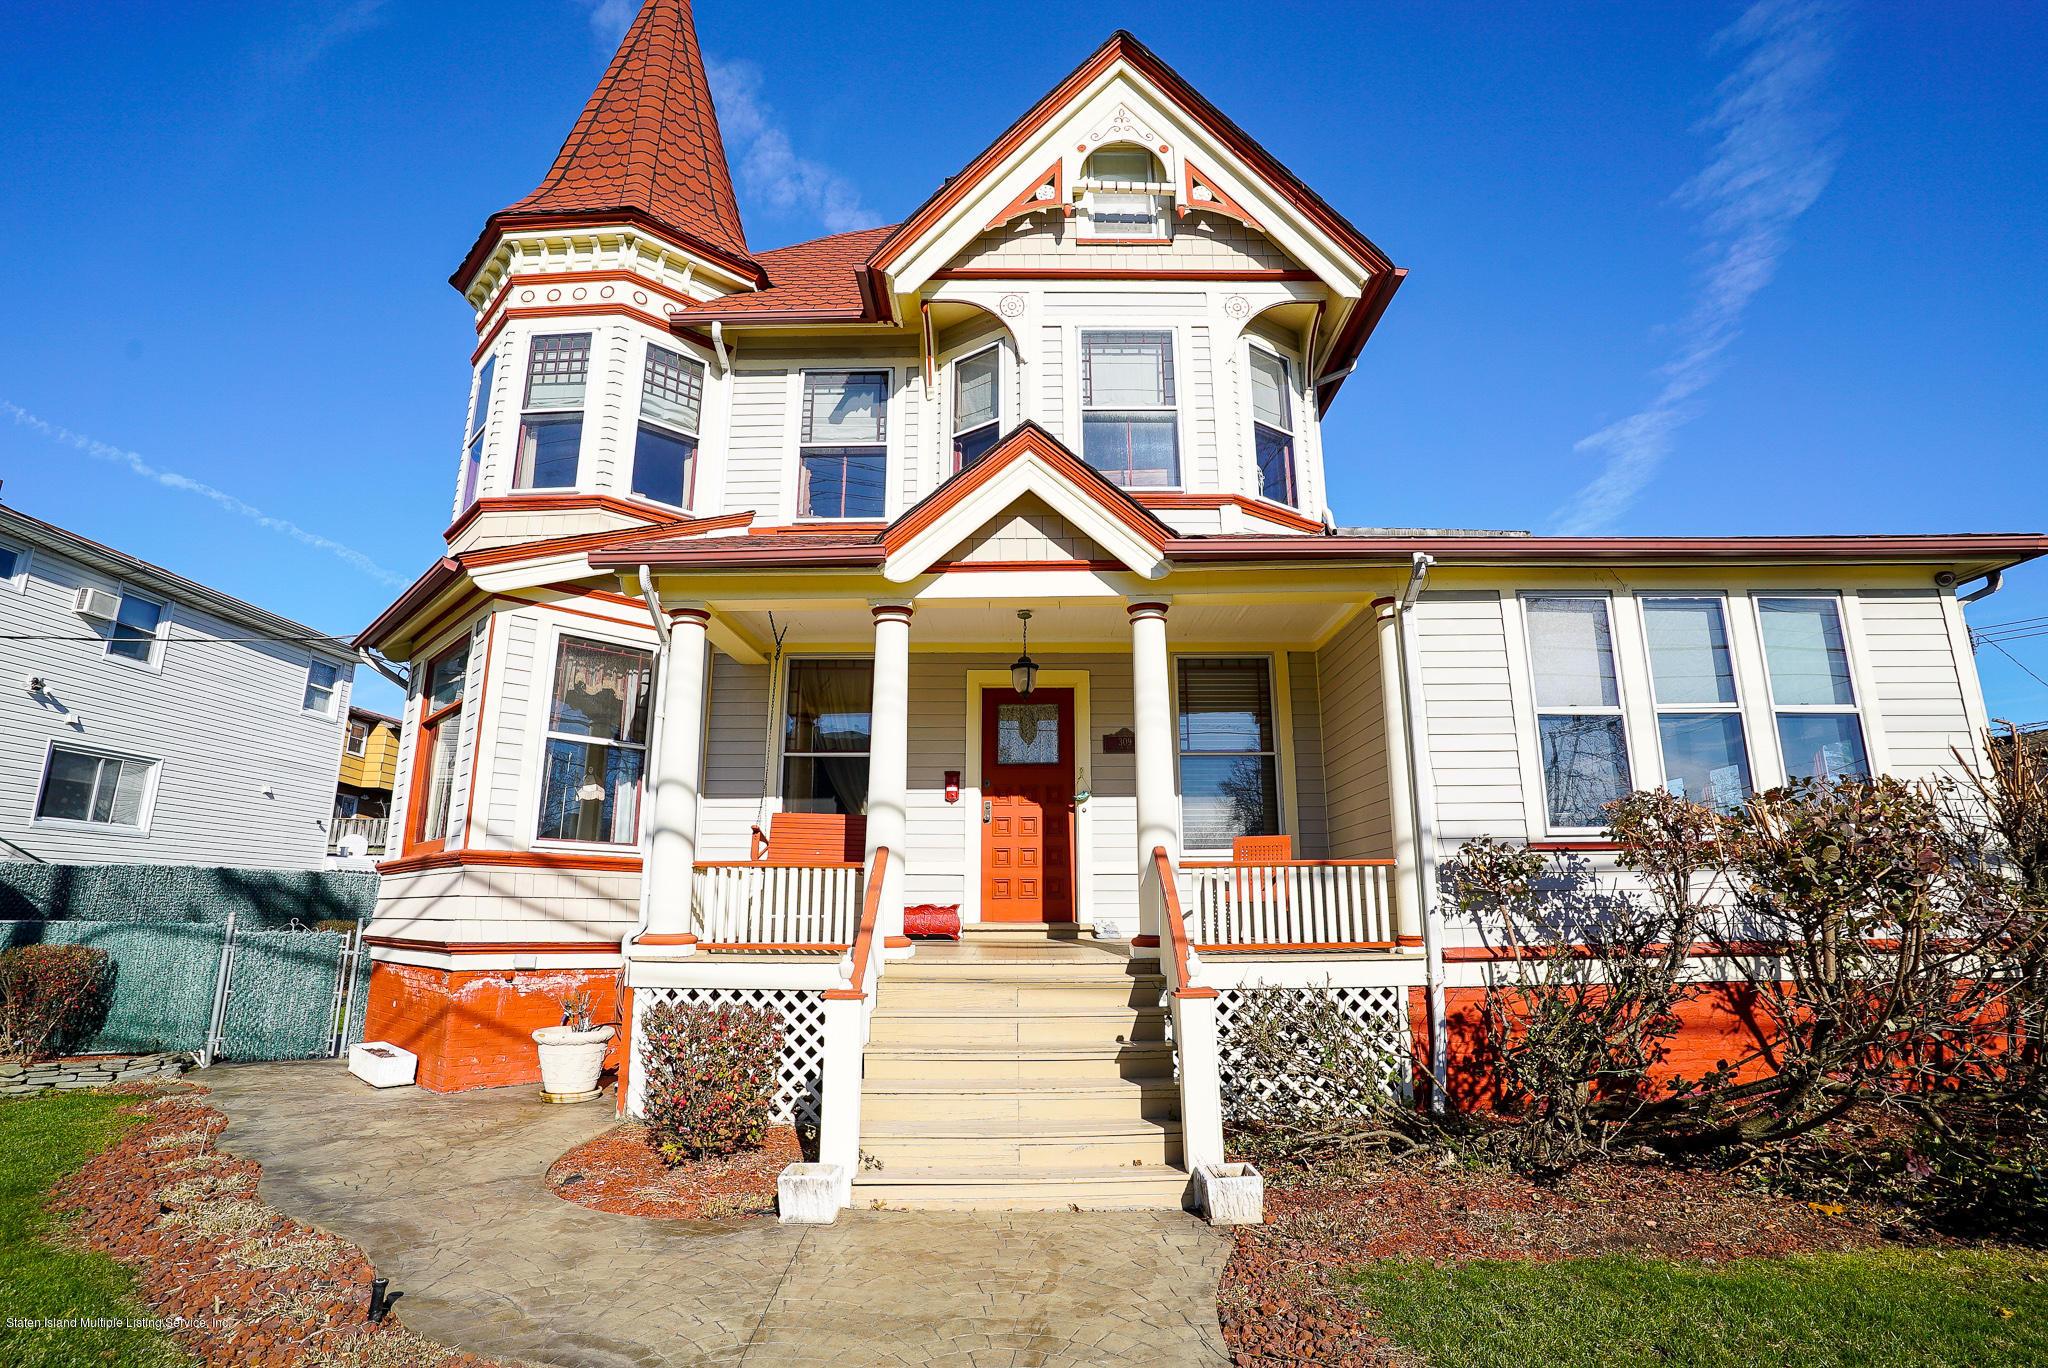 Single Family - Detached 309 Guyon Avenue  Staten Island, NY 10306, MLS-1142302-2